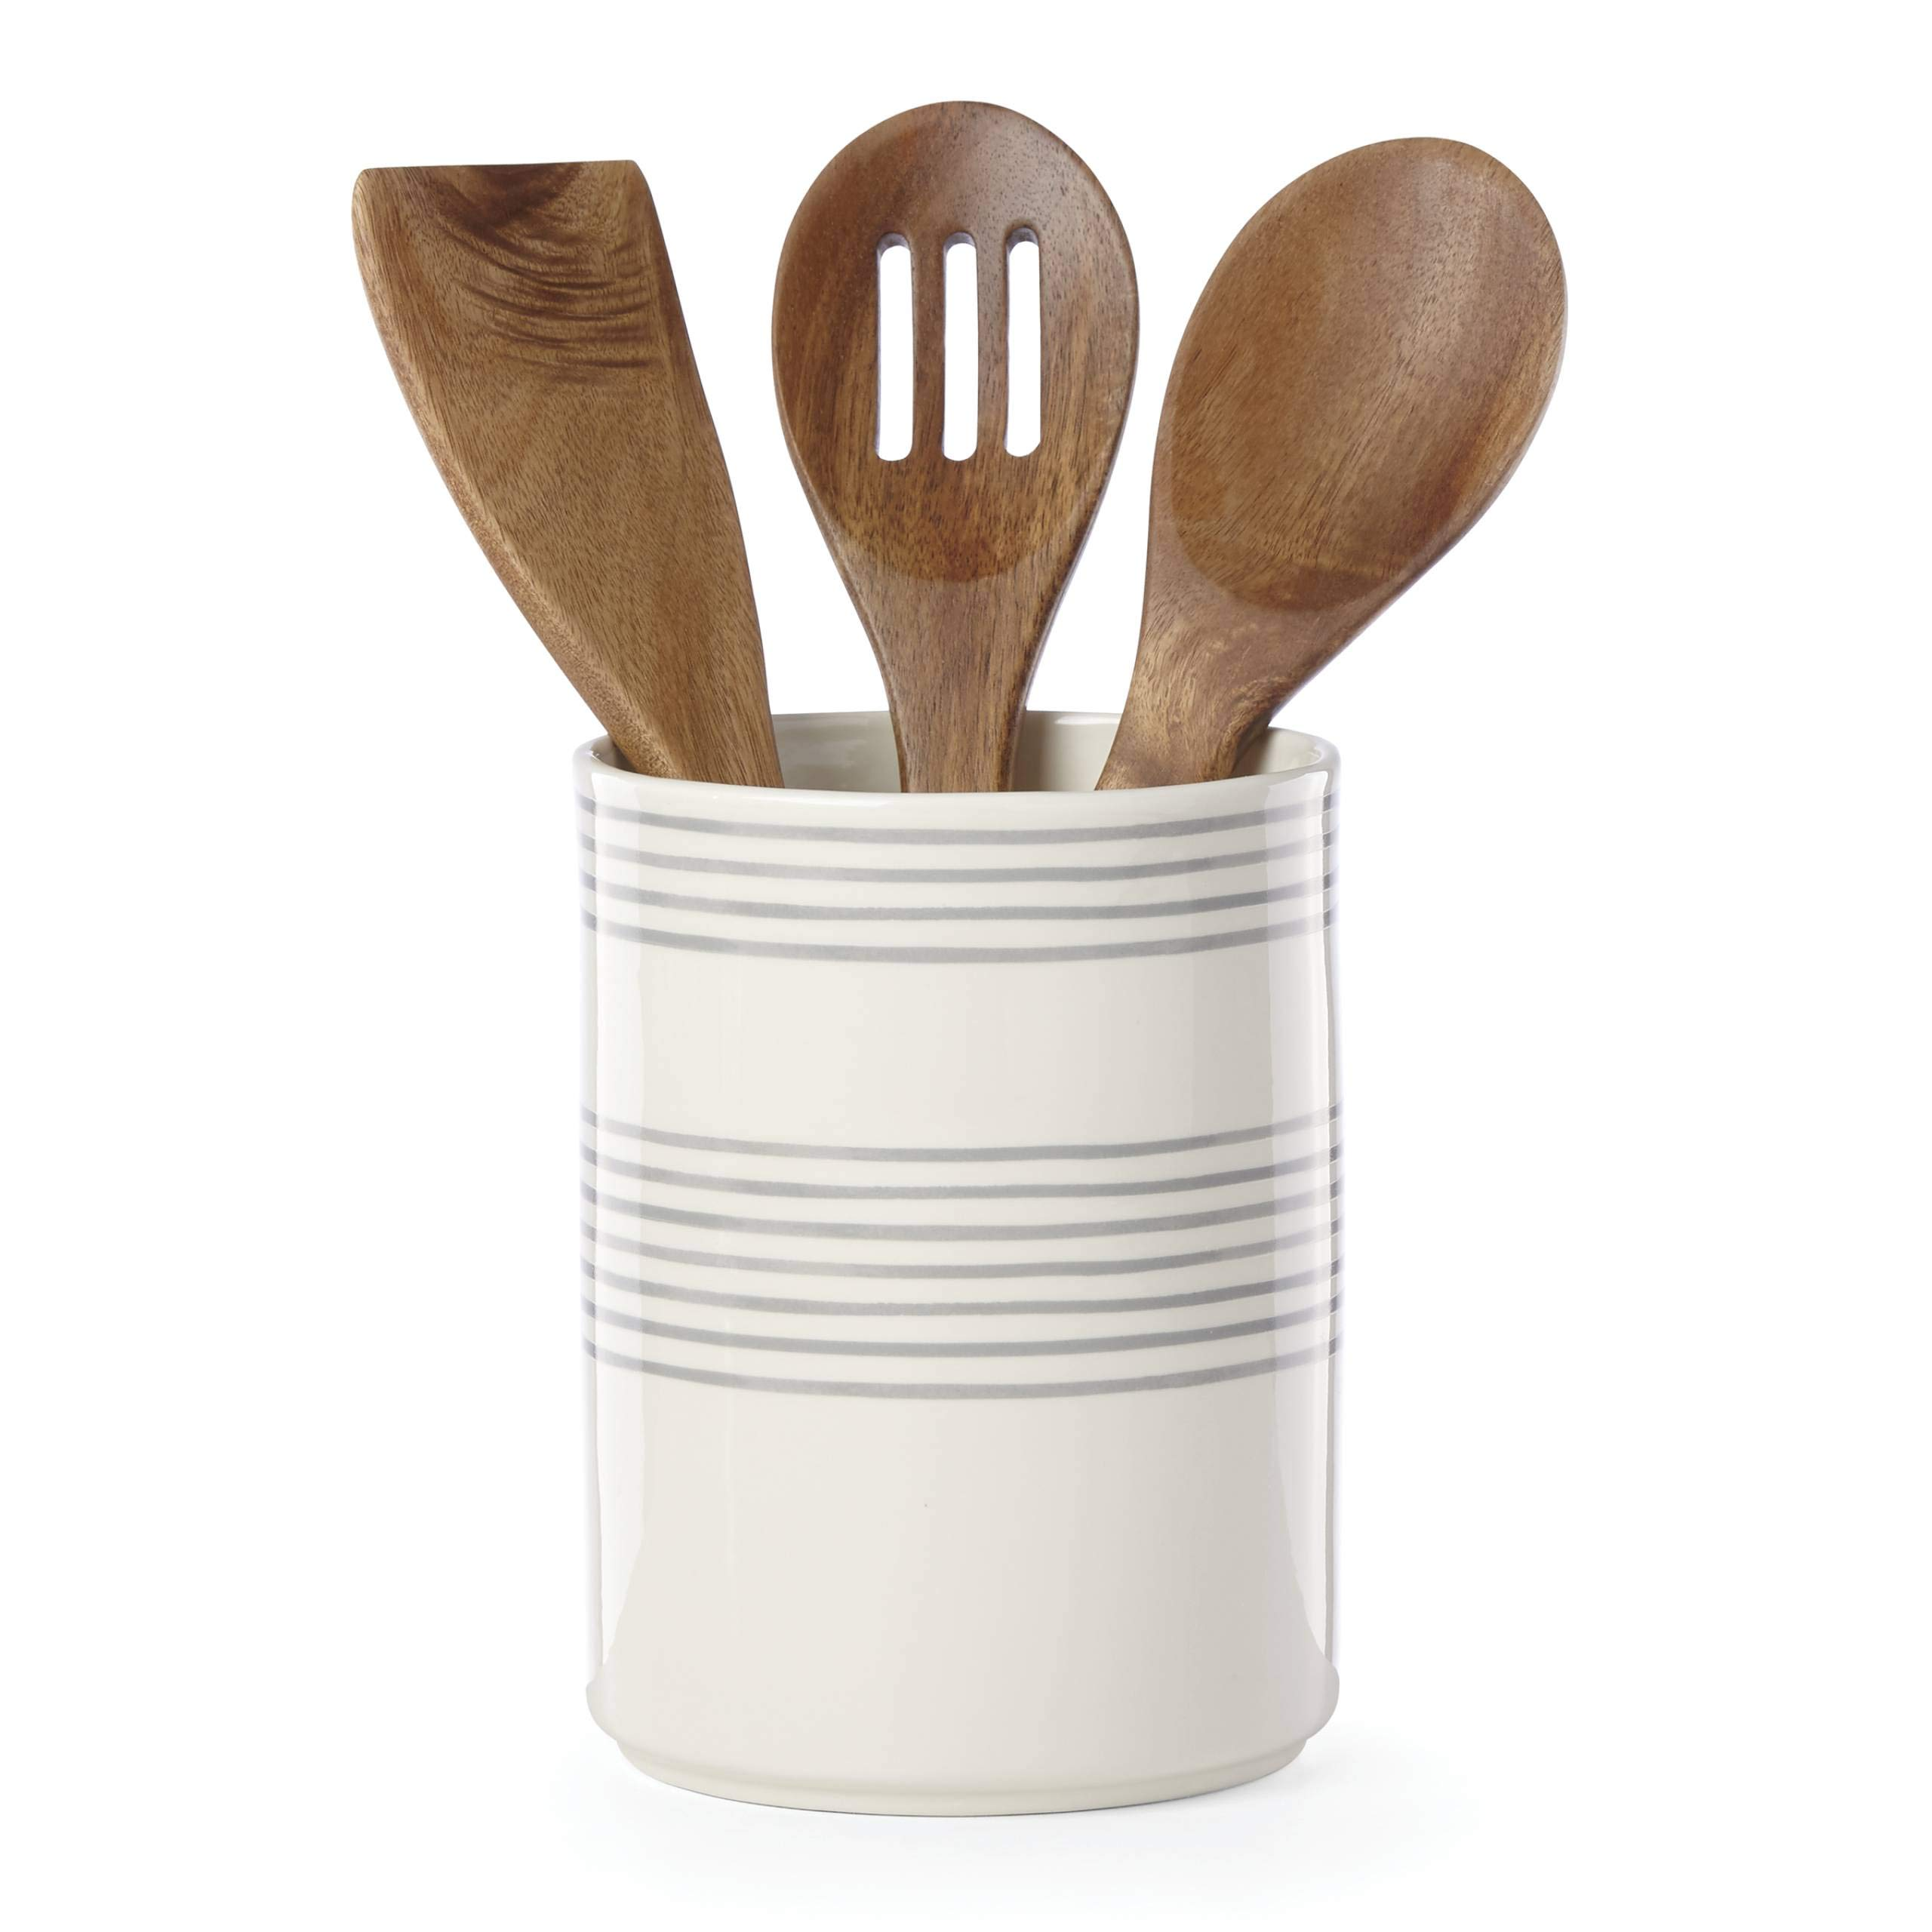 Kate Spade New York 885896 Charlotte Street utensil crock by Kate Spade New York